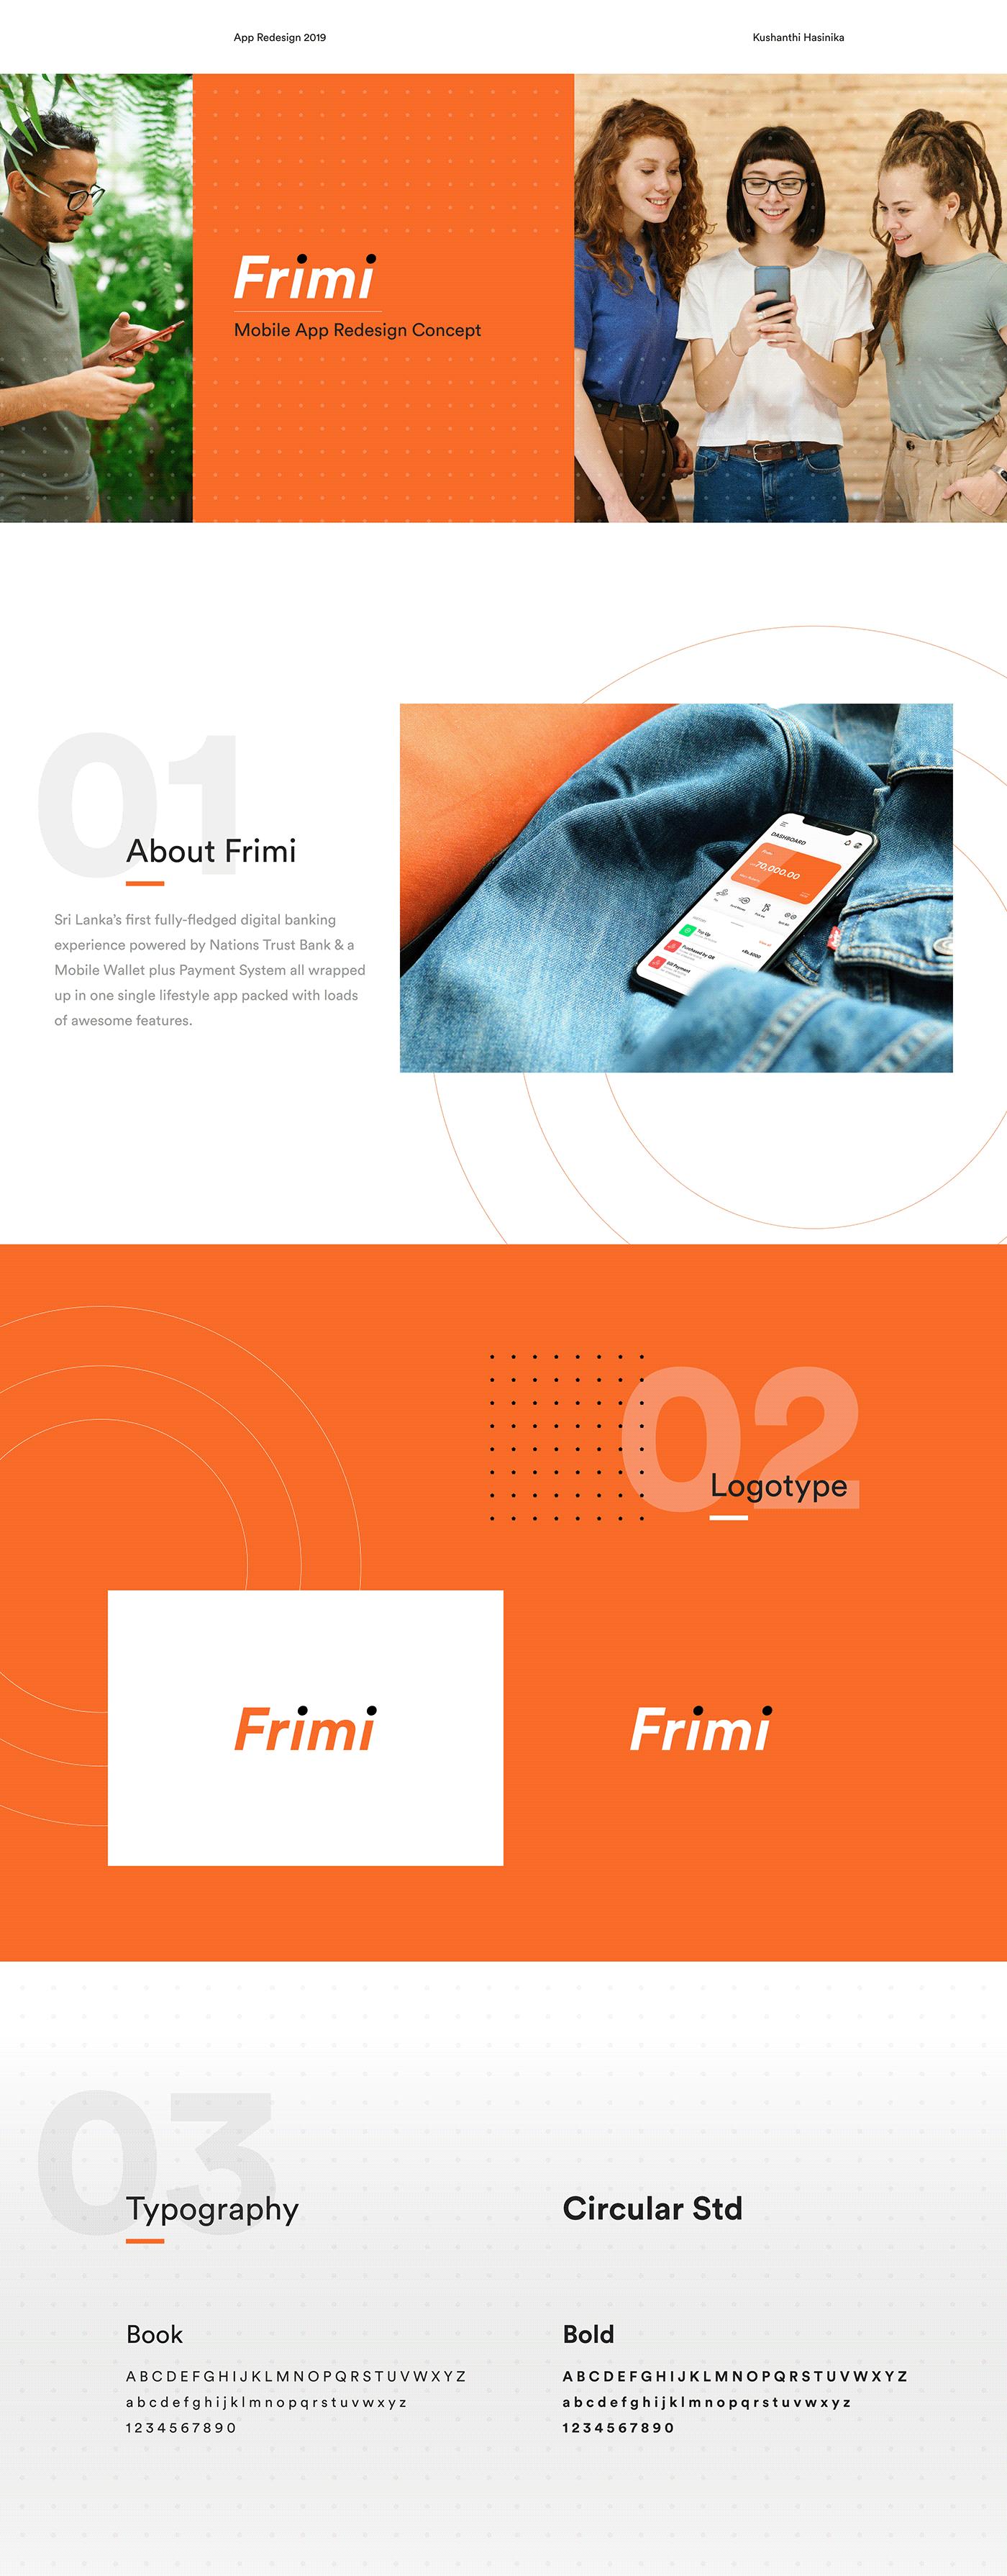 Mobile app Adobe XD concept design UI ux redesign banking app Frimi